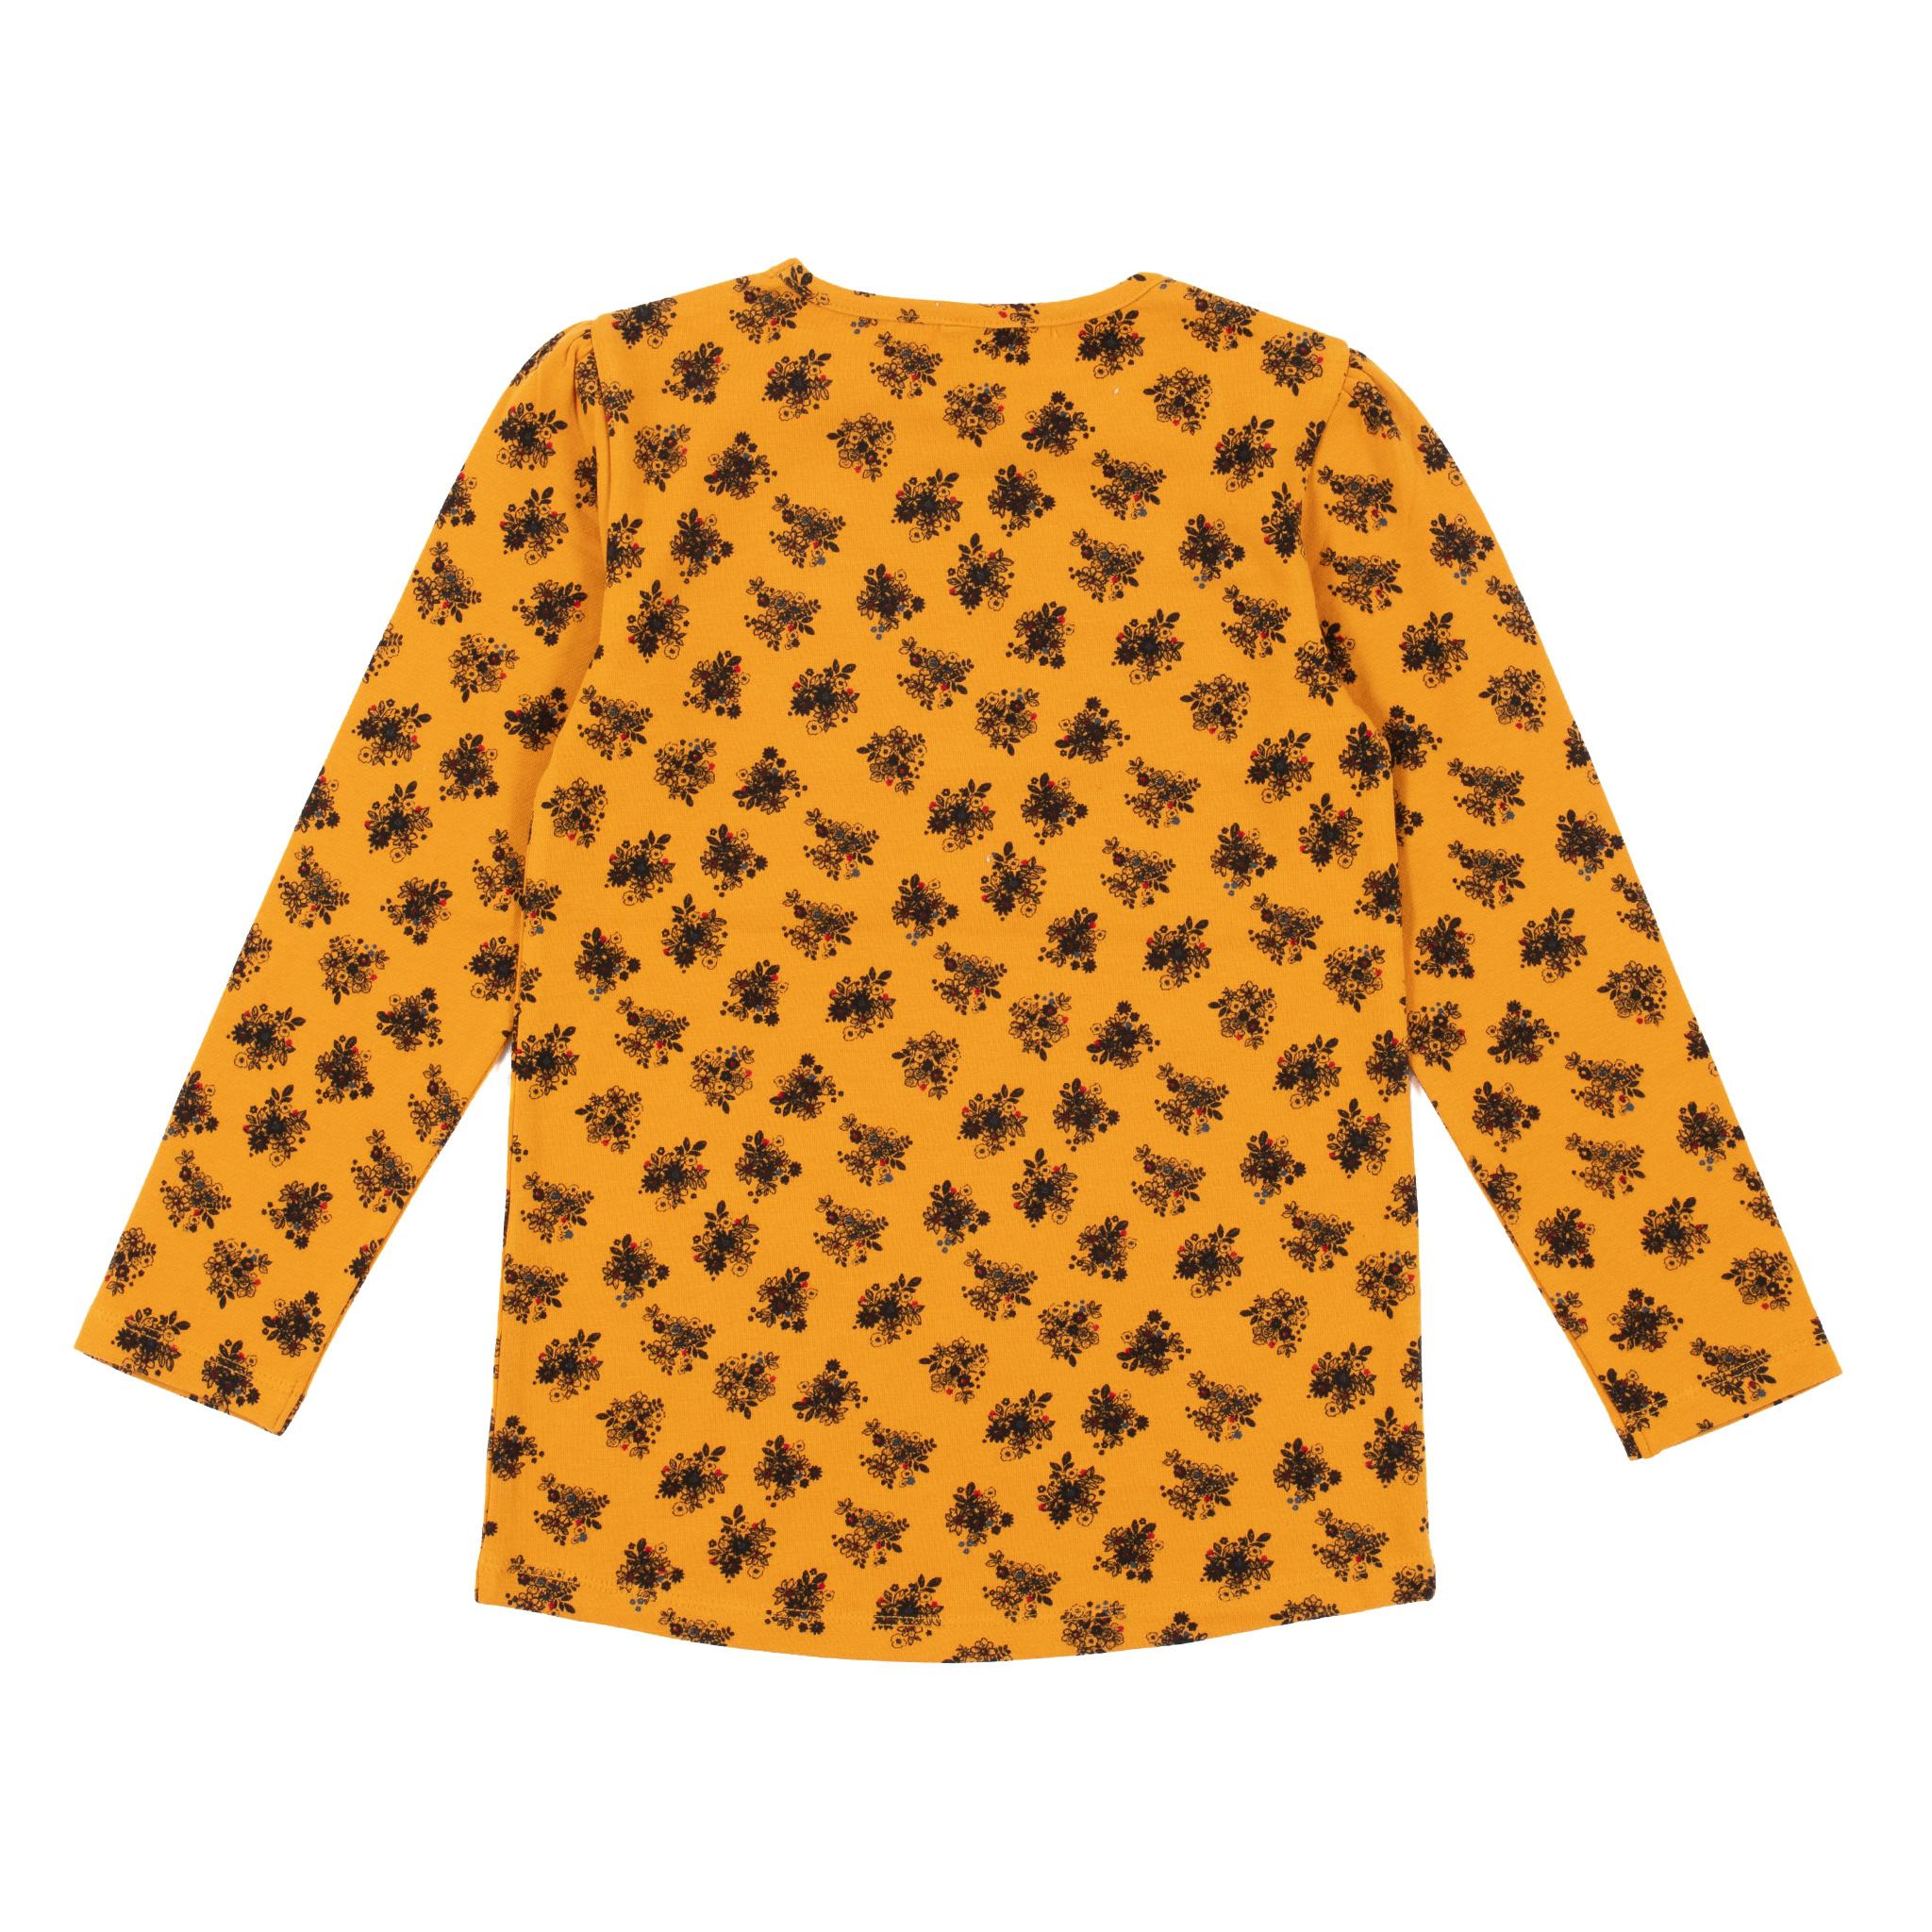 Chandail collection En mode Rodéo-2